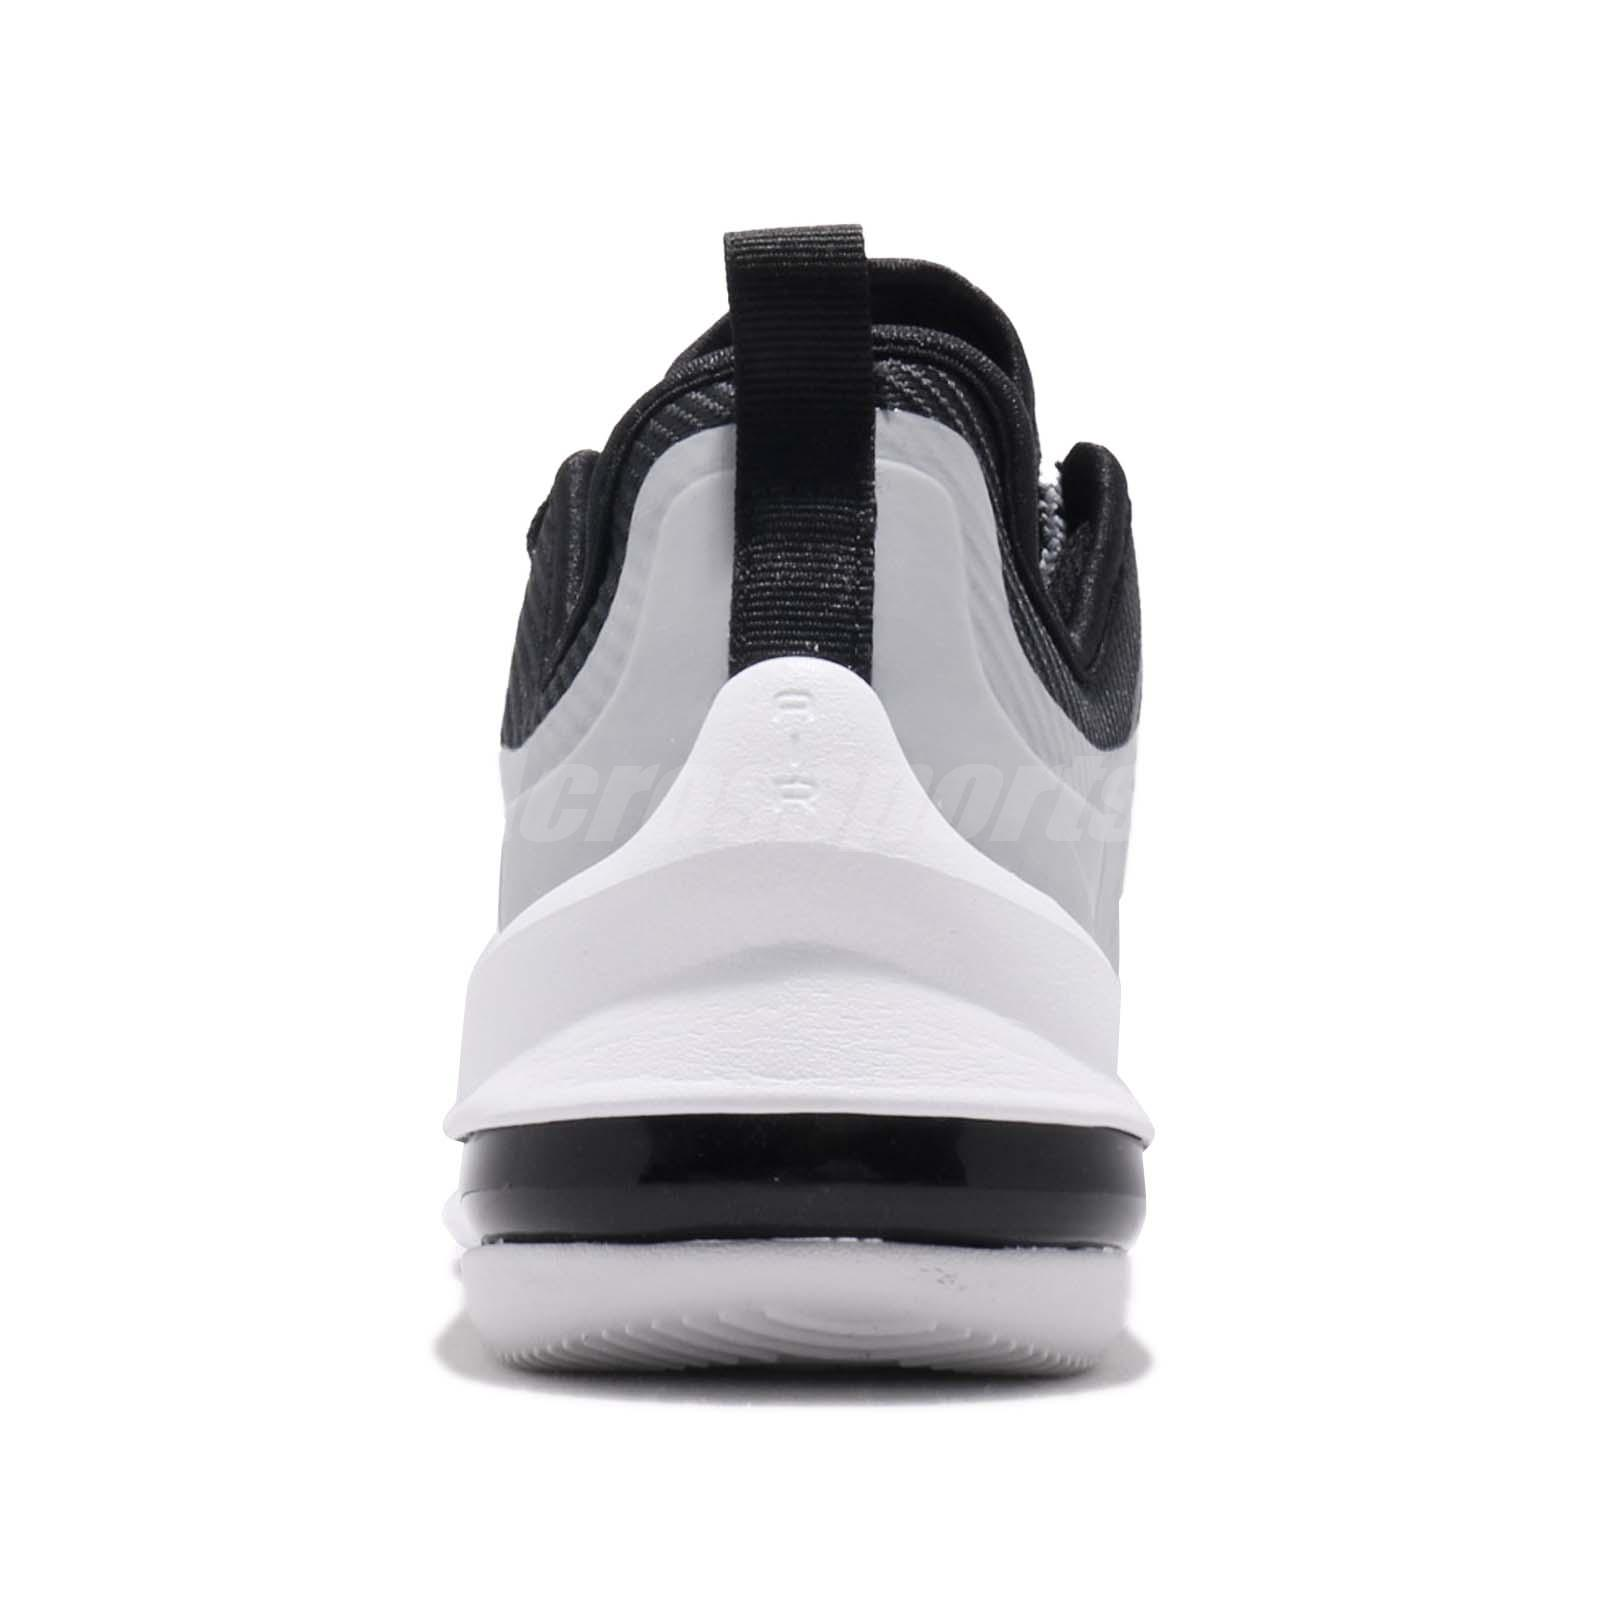 Nike Wmns Air Max Axis SE Black Grey White Women Running Shoe ... 673686703